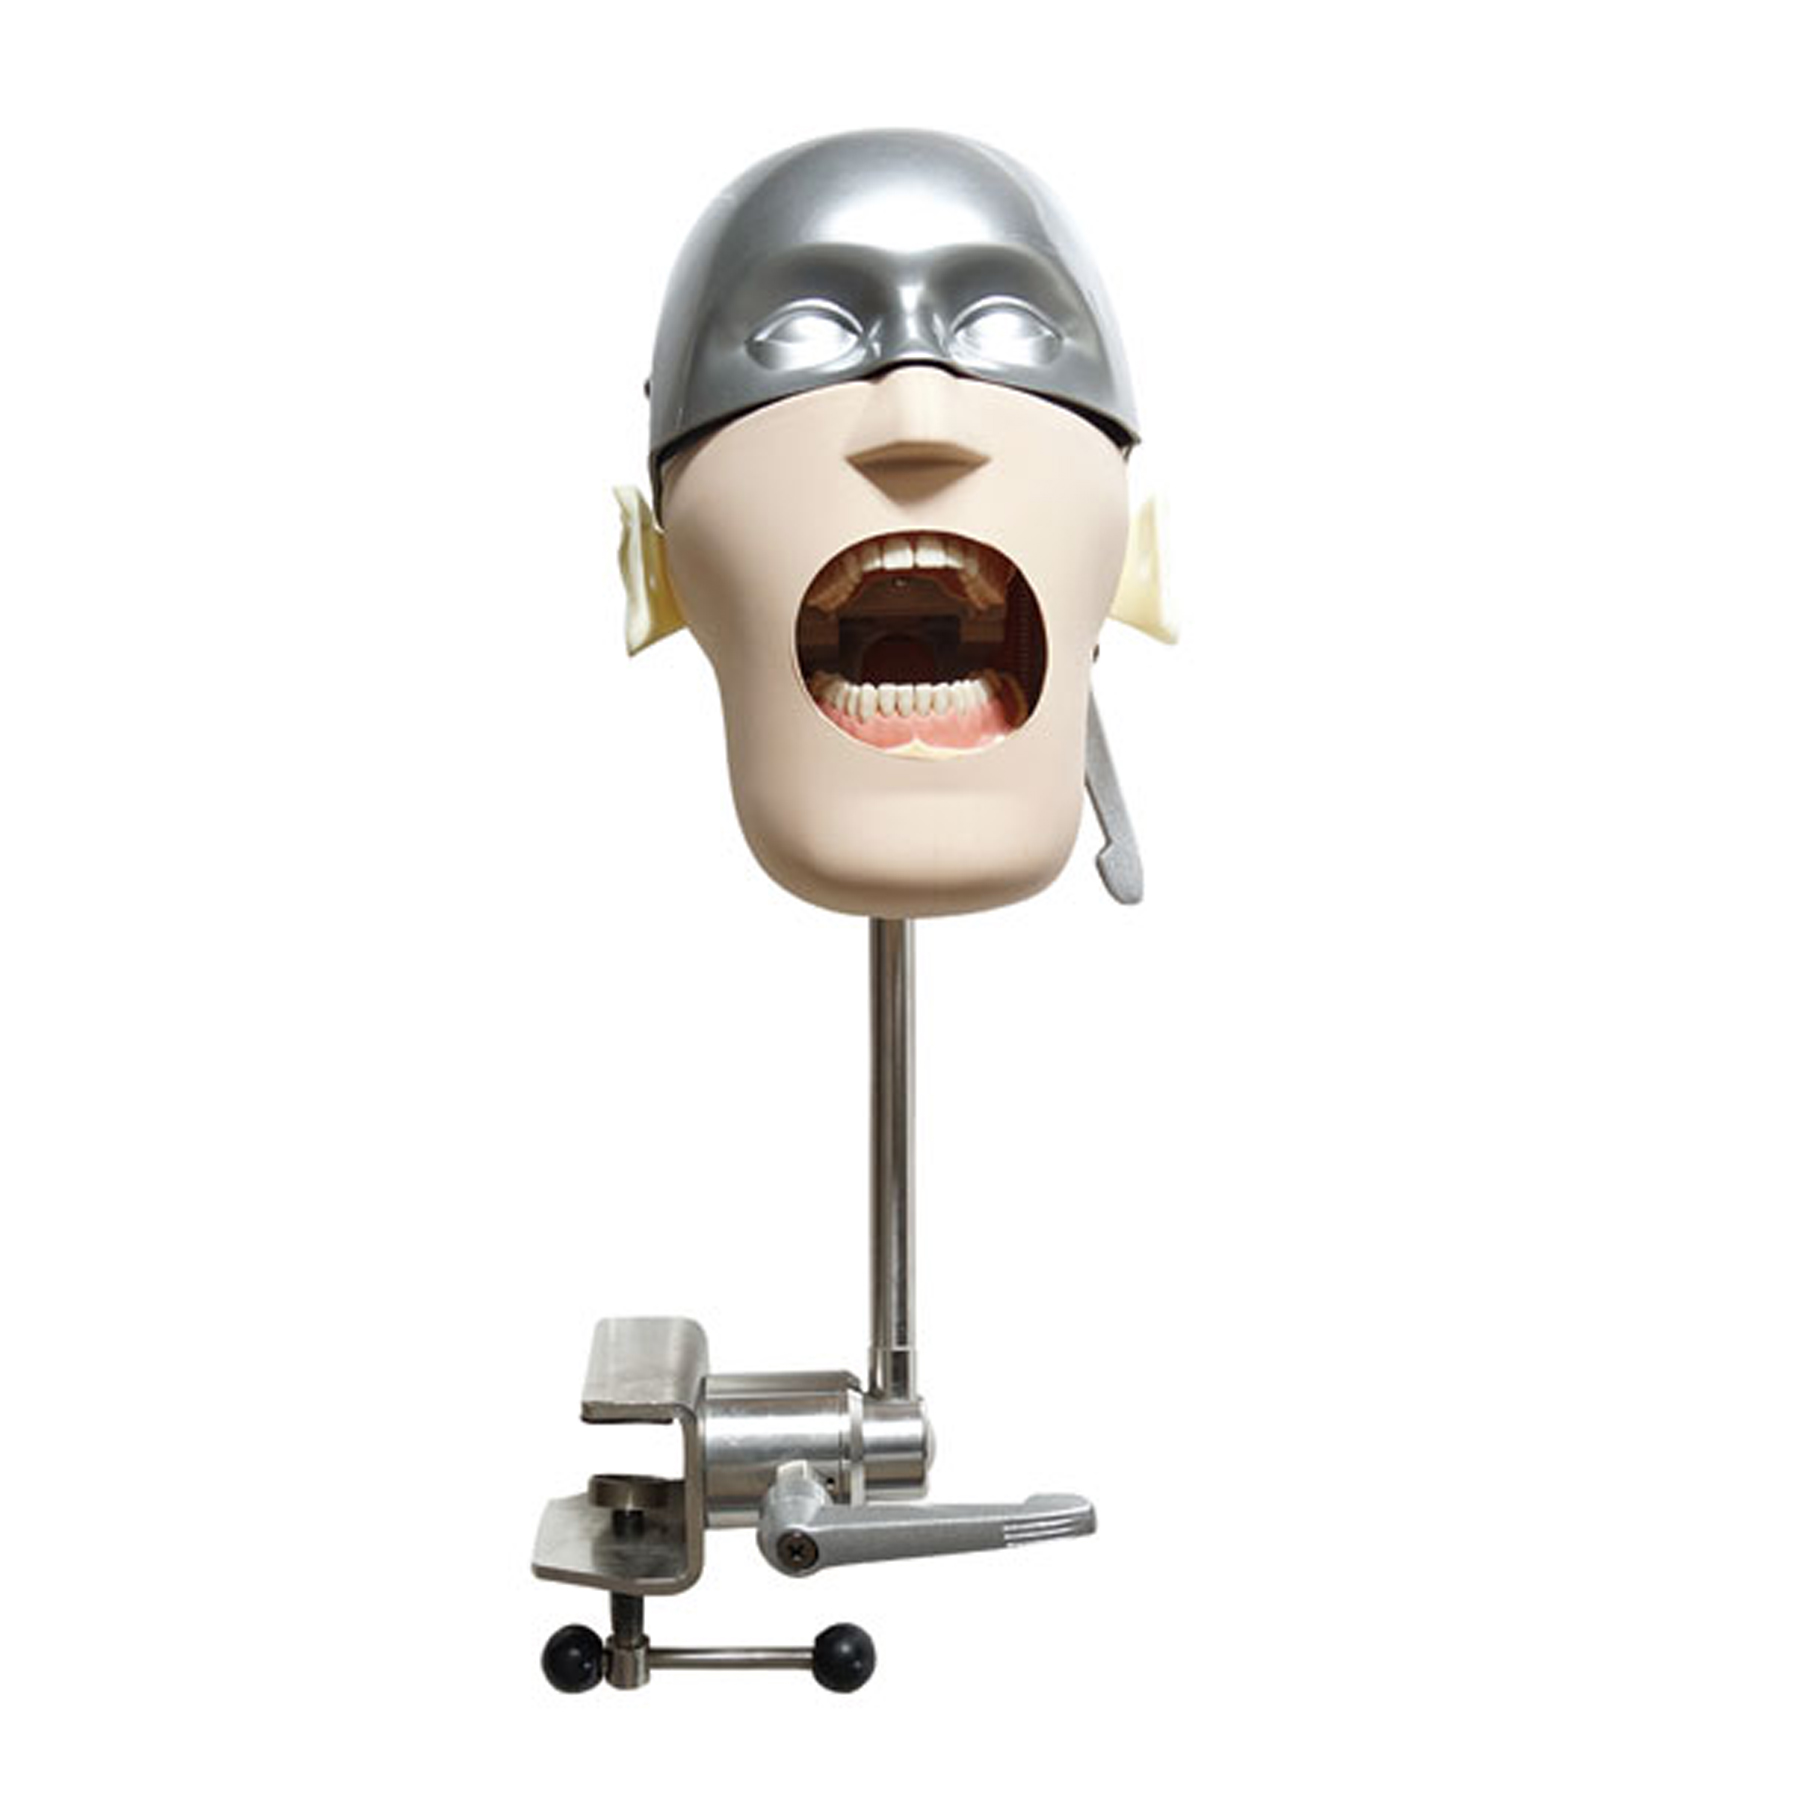 TM-U6 Phantom Head with Face Mask